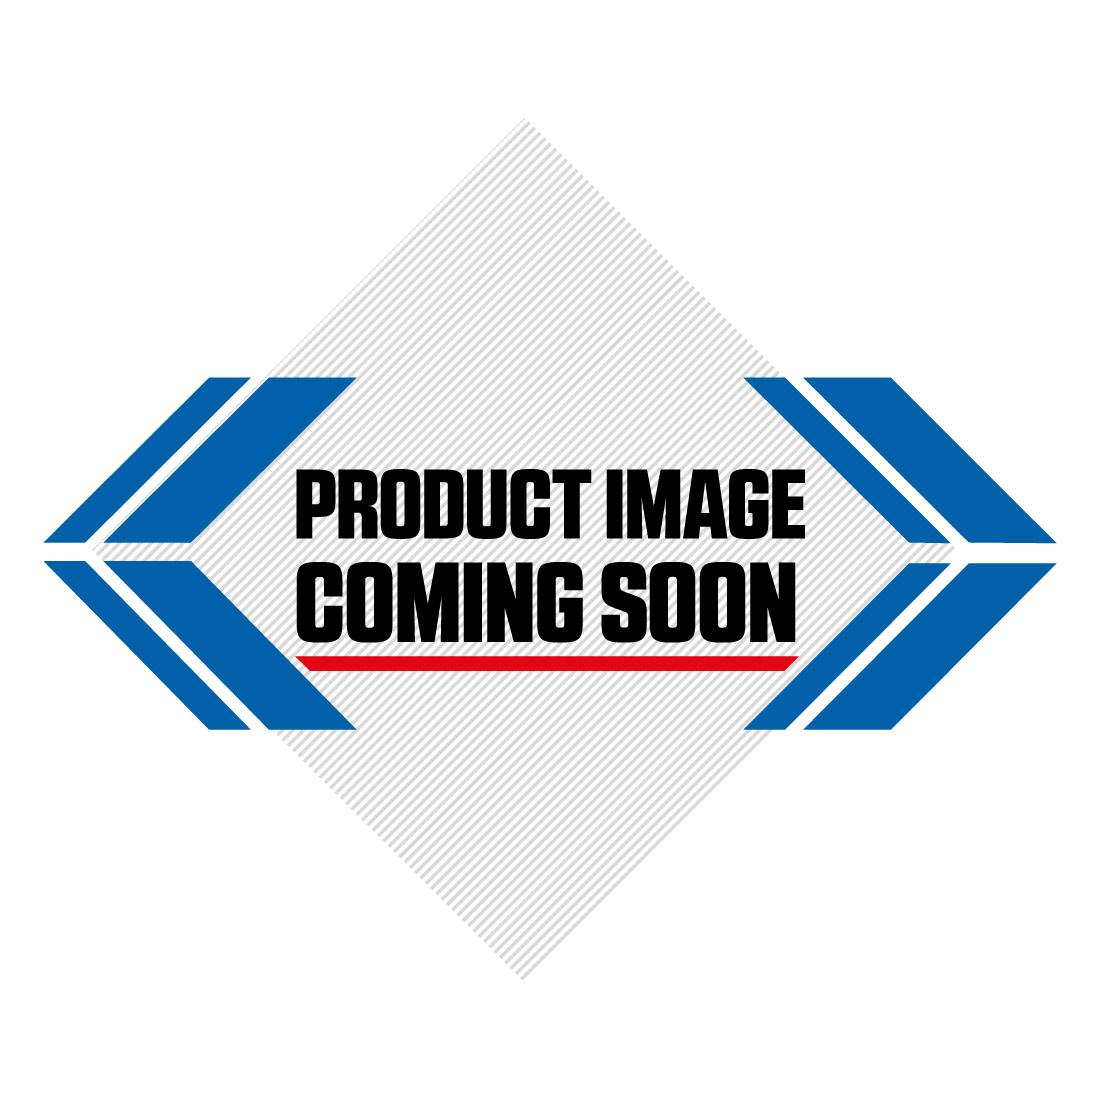 DJI Goggles - Immersive FPV Goggles Image-1>